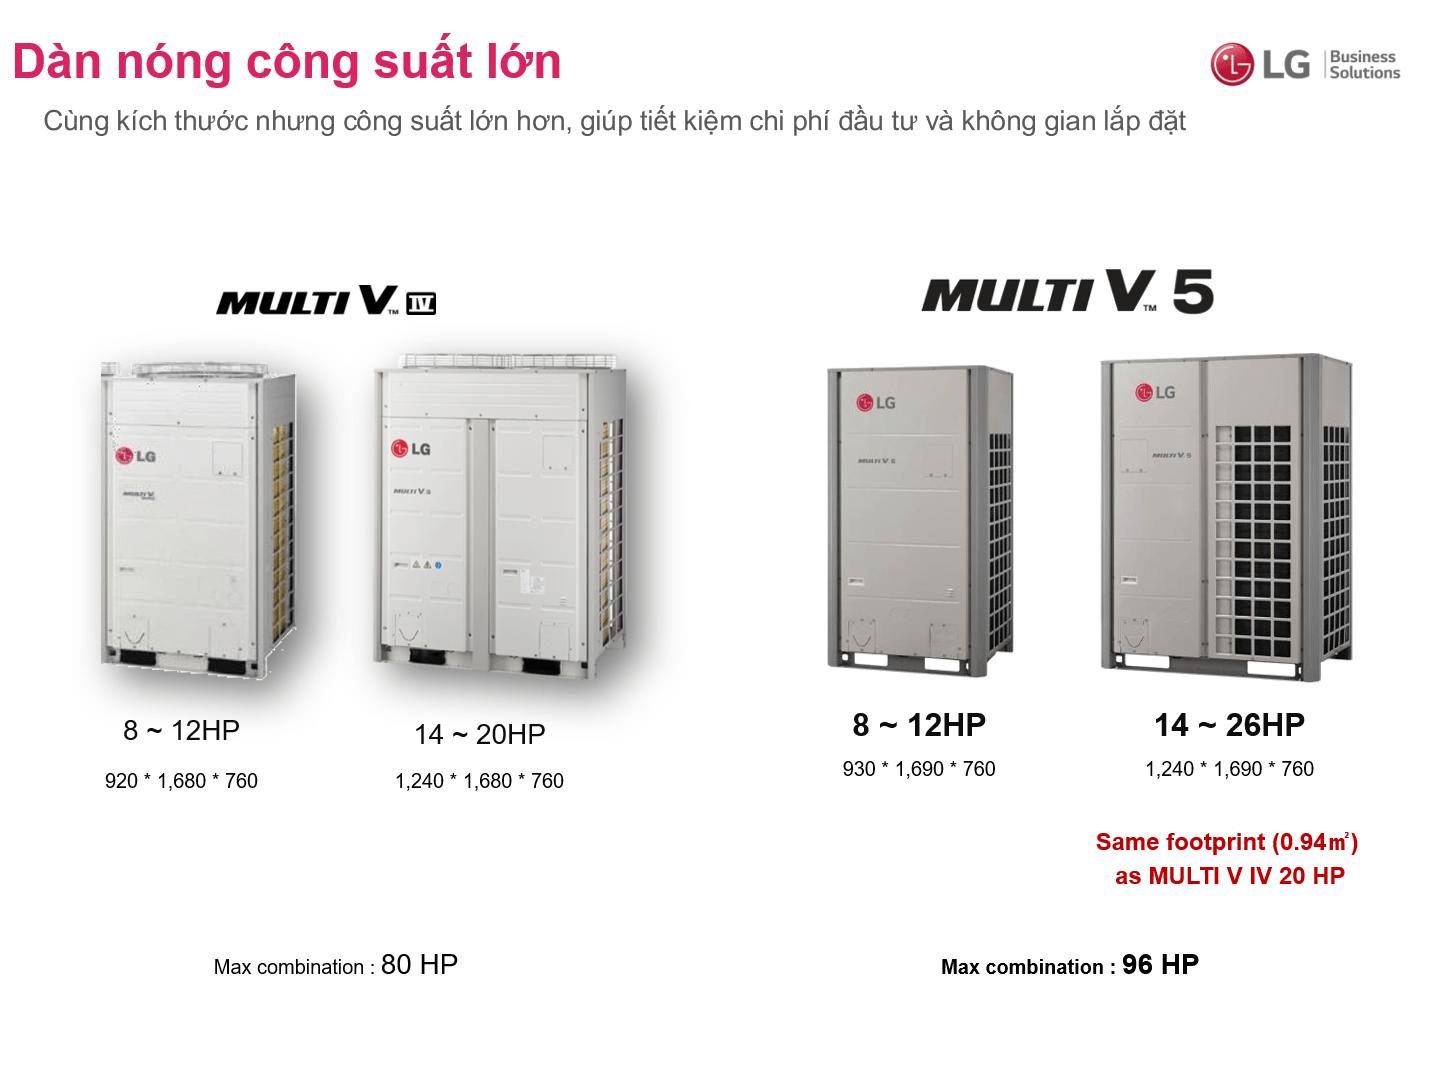 dieu hoa trung tam vrf lg multi v5 2 - HVAC Việt Nam